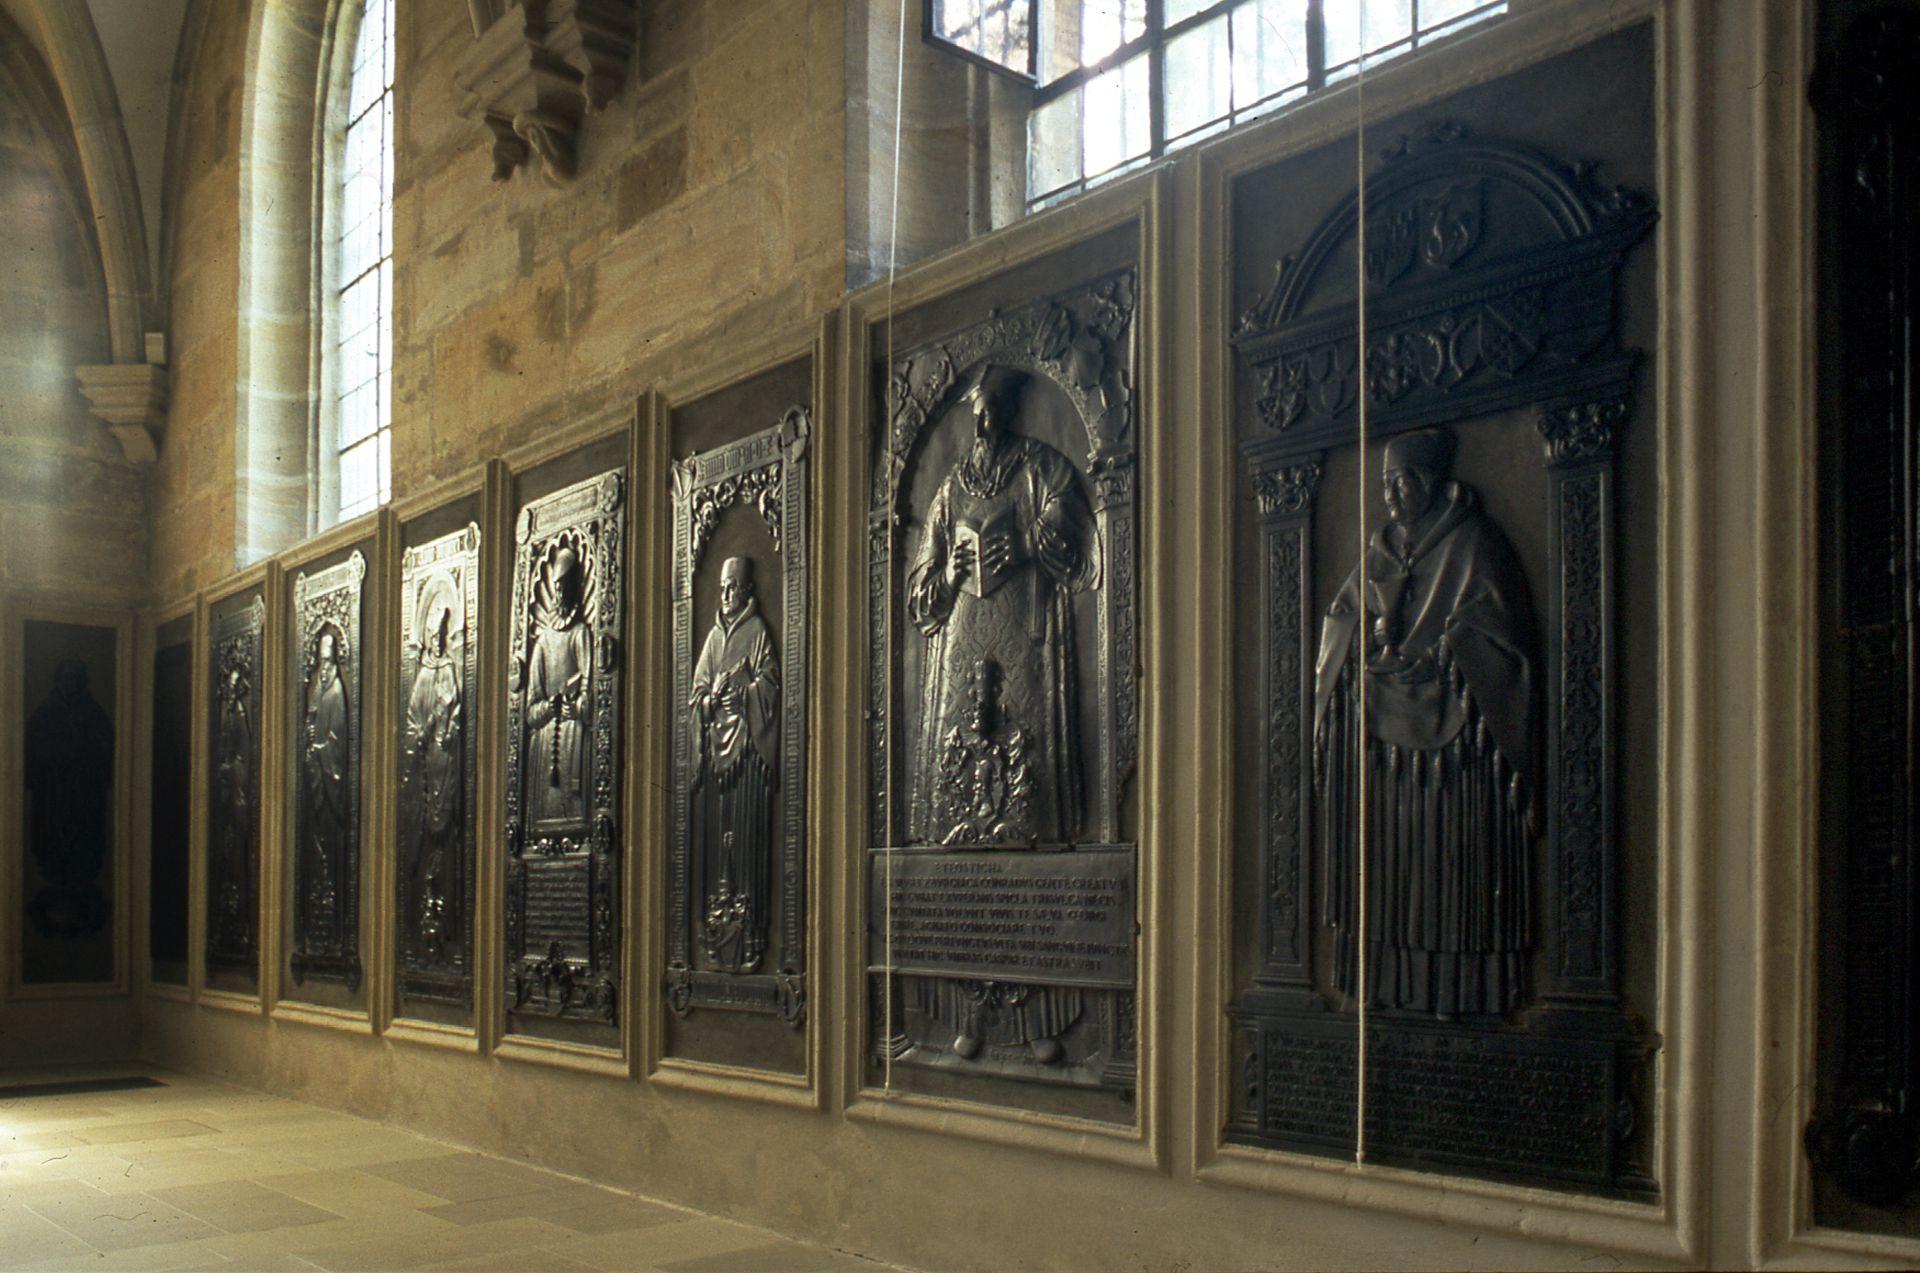 Grabplatten Nagelkapelle